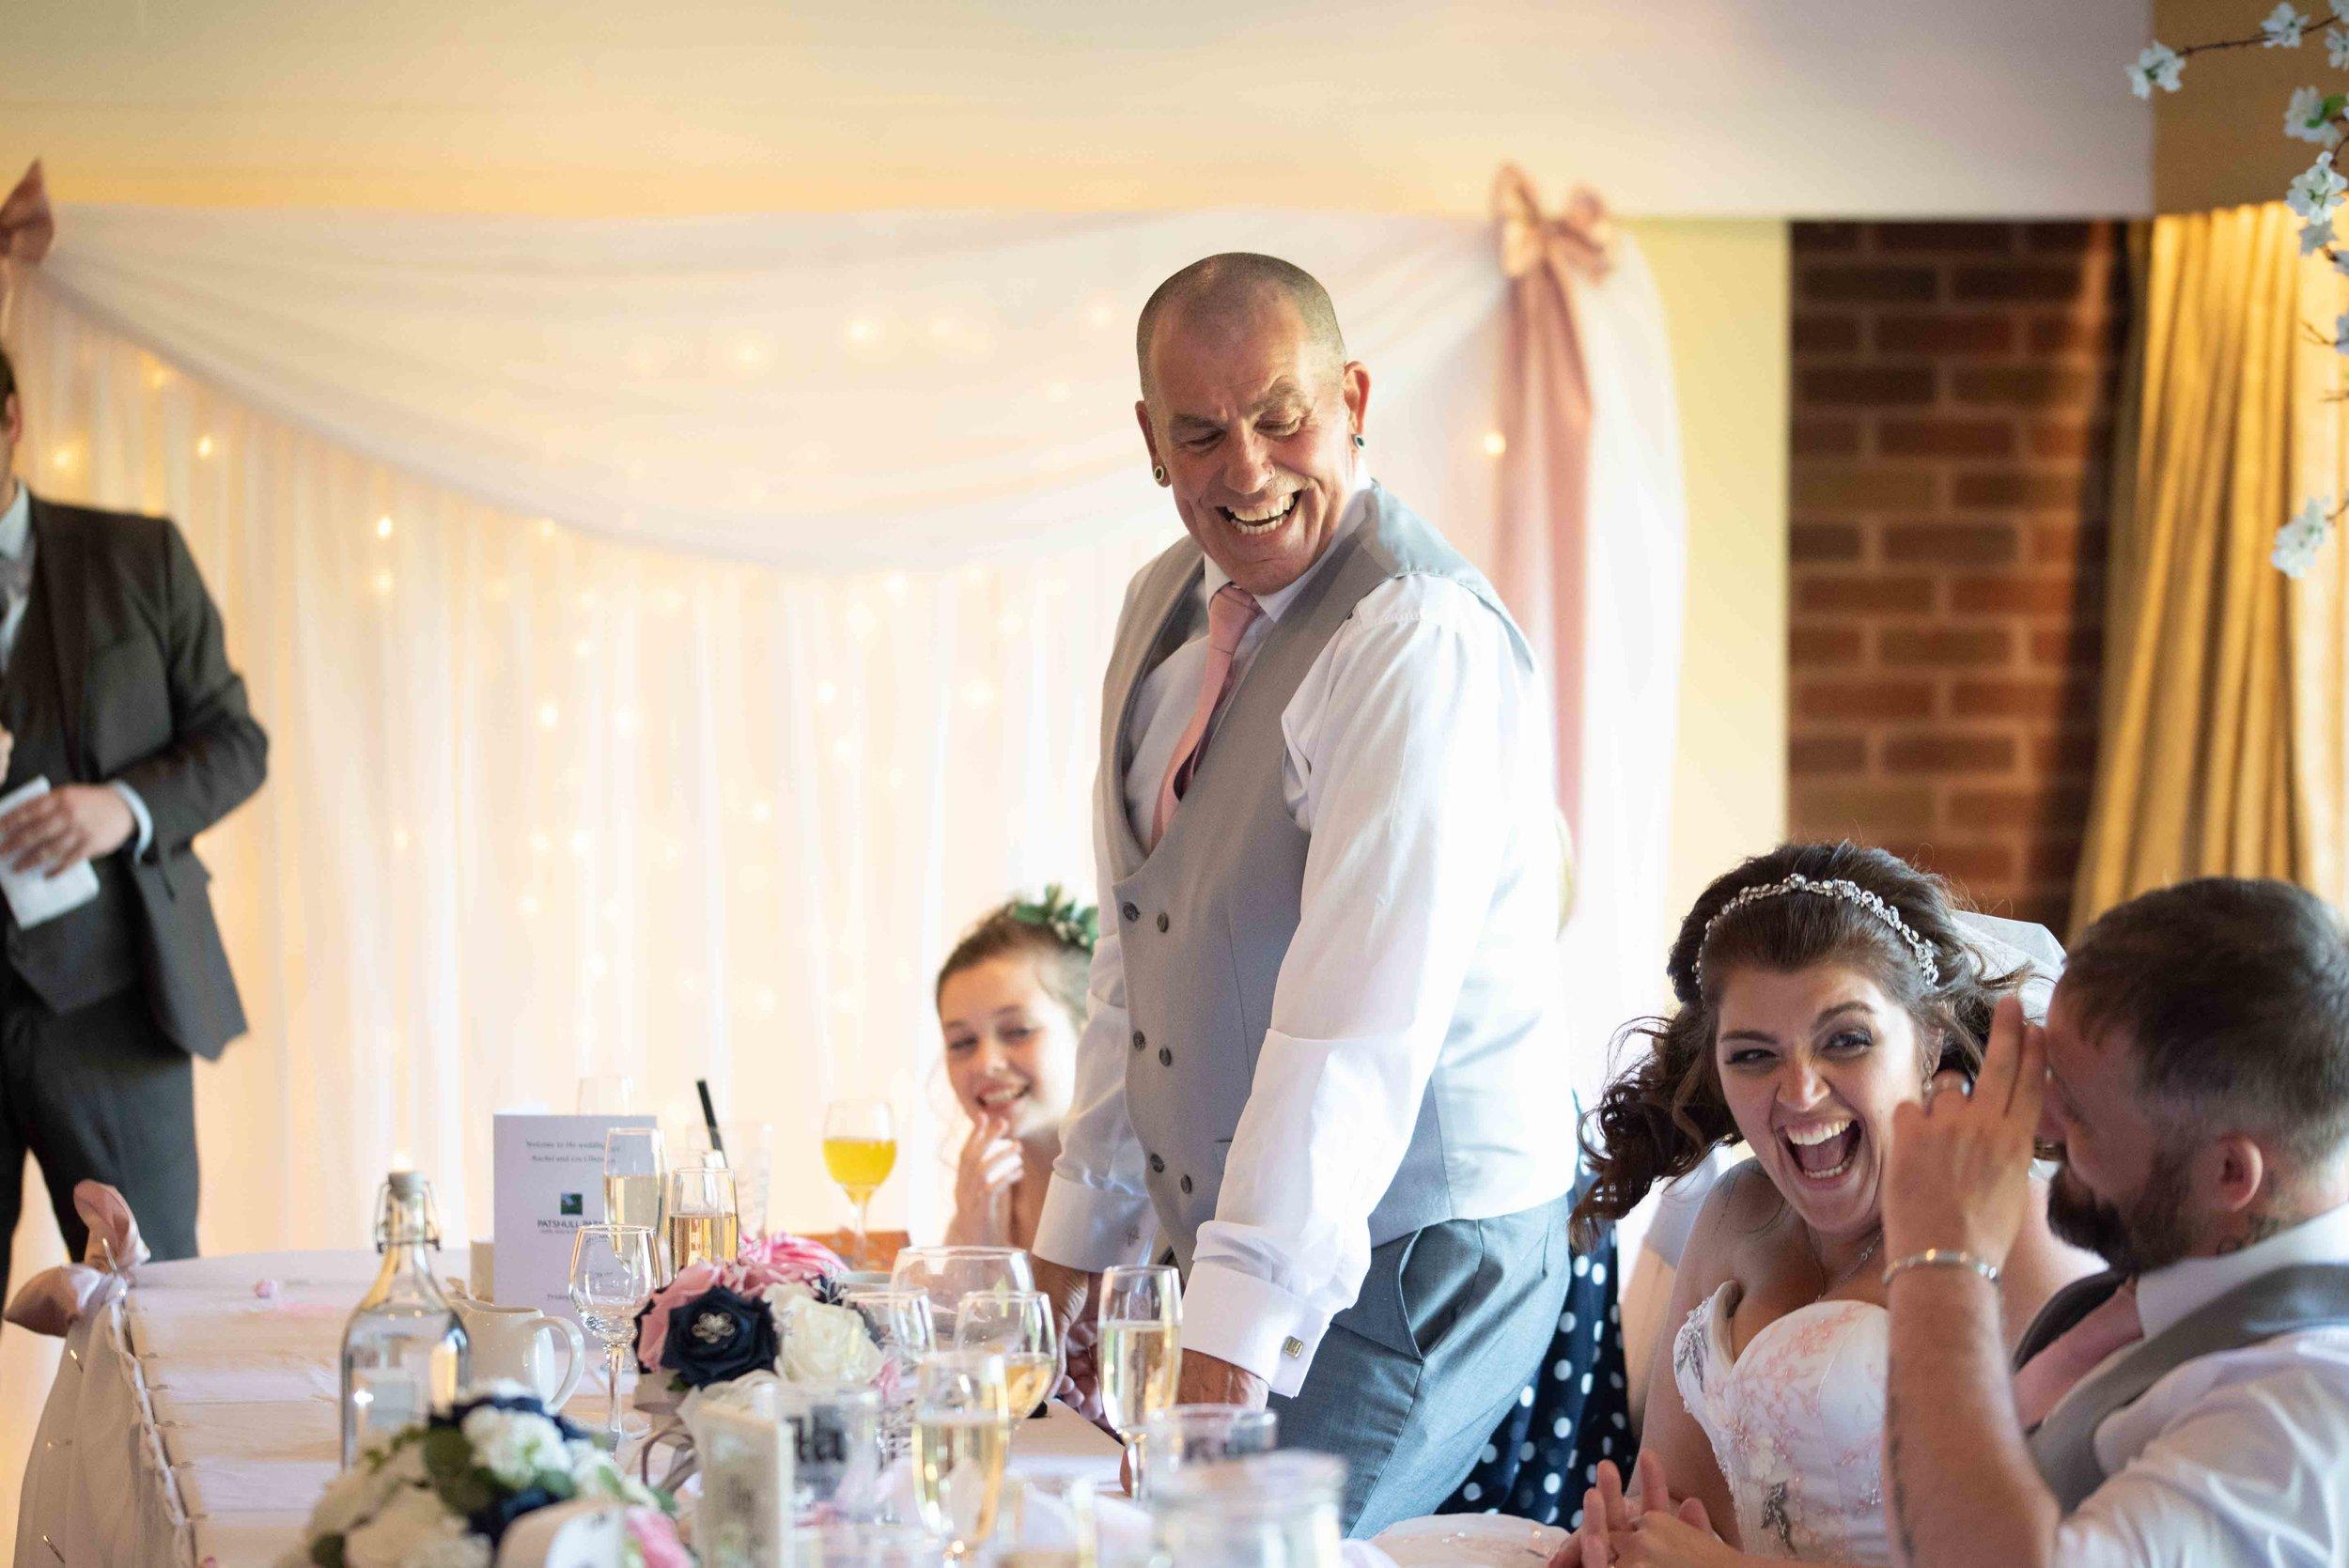 Lea-cooper-photography-wedding-photography-wolverhampton-patshull-park-hotel-wedding-pattingham-wolverhampton-west-midlands-uk-27.JPG